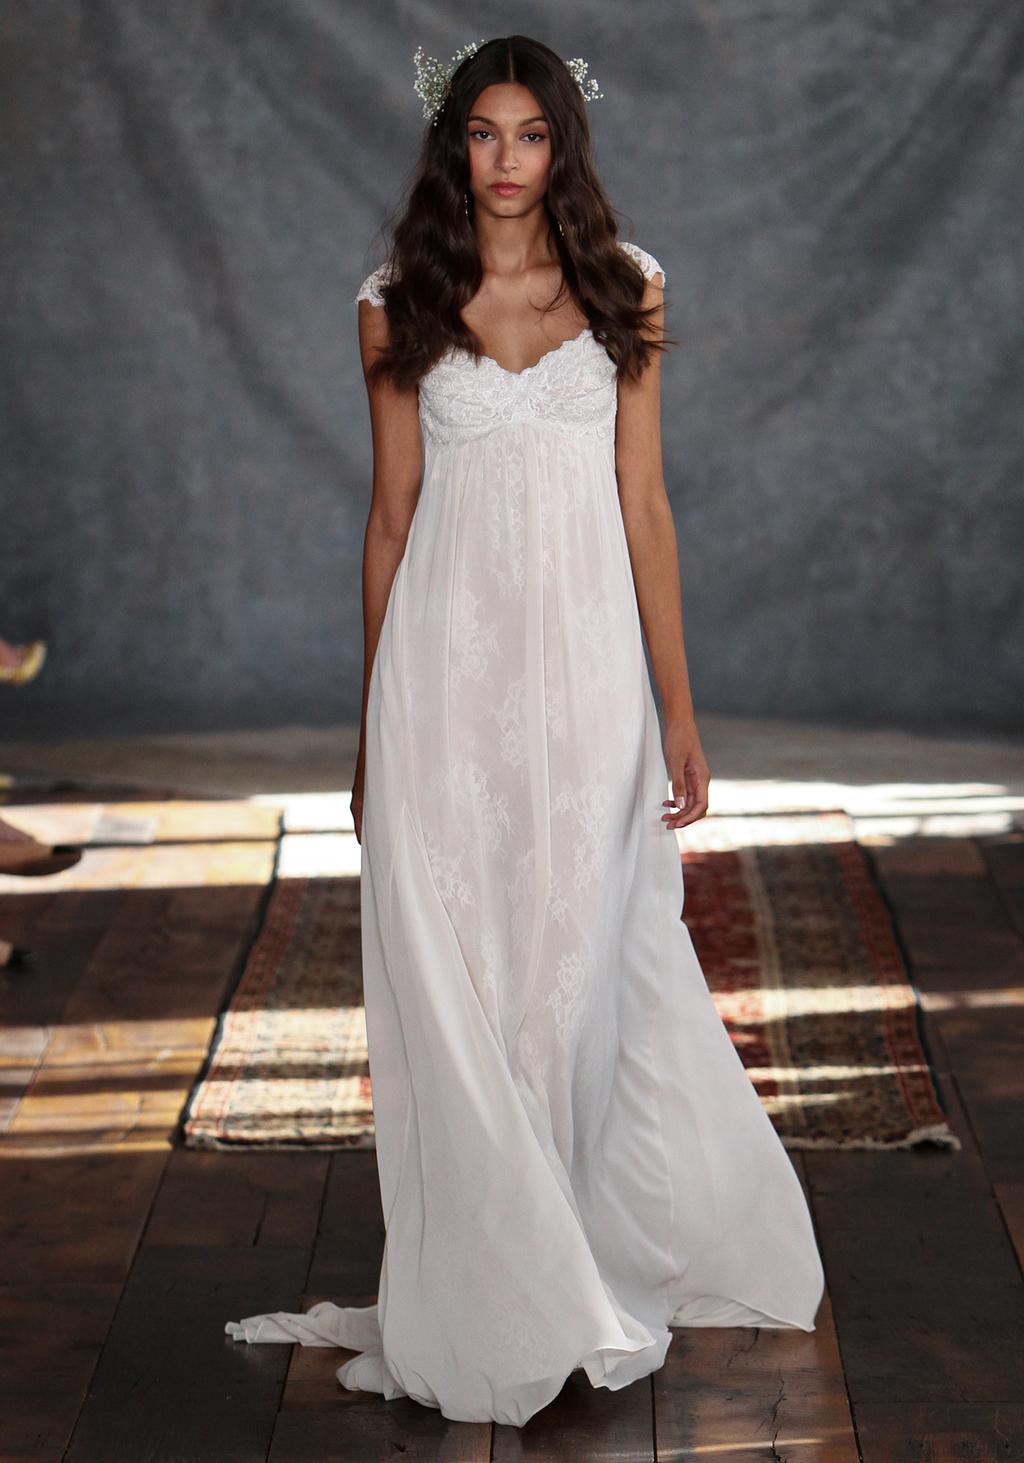 Phaedra_wedding_dress_from_claire_pettibones_romantique_collection.full